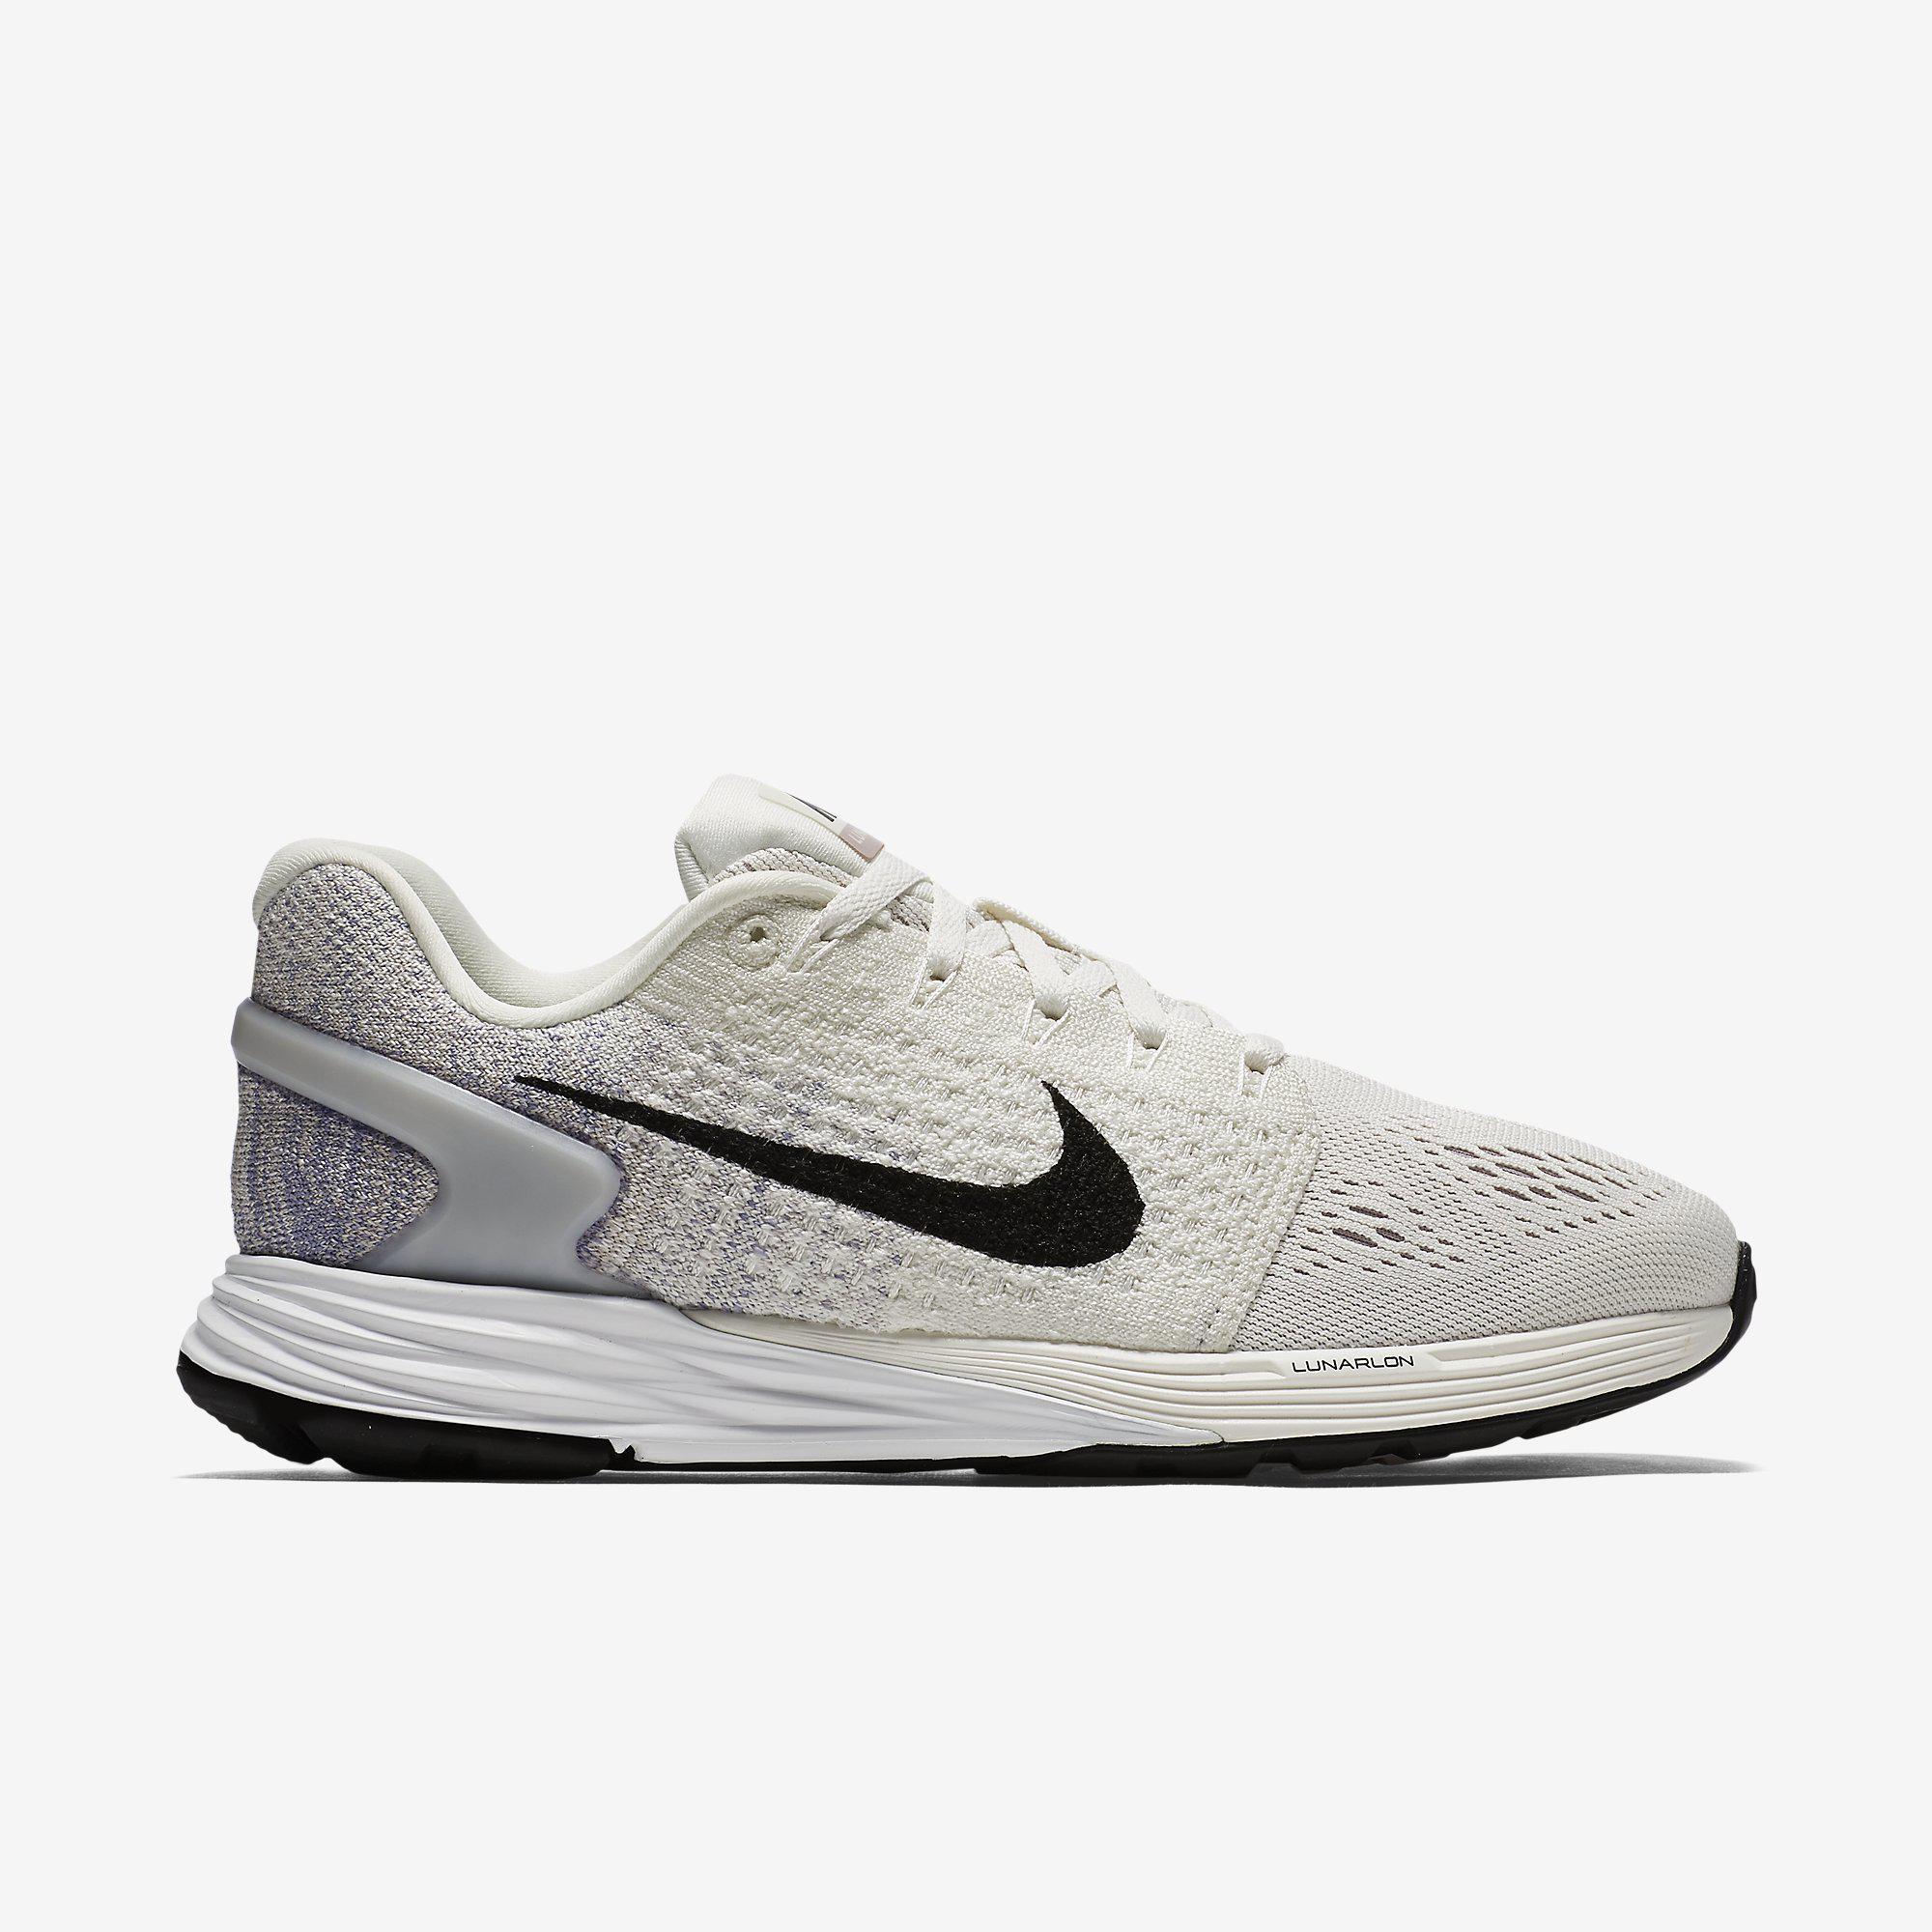 d267ebd3d3f3 Nike Womens LunarGlide 7 Running Shoes - White - Tennisnuts.com